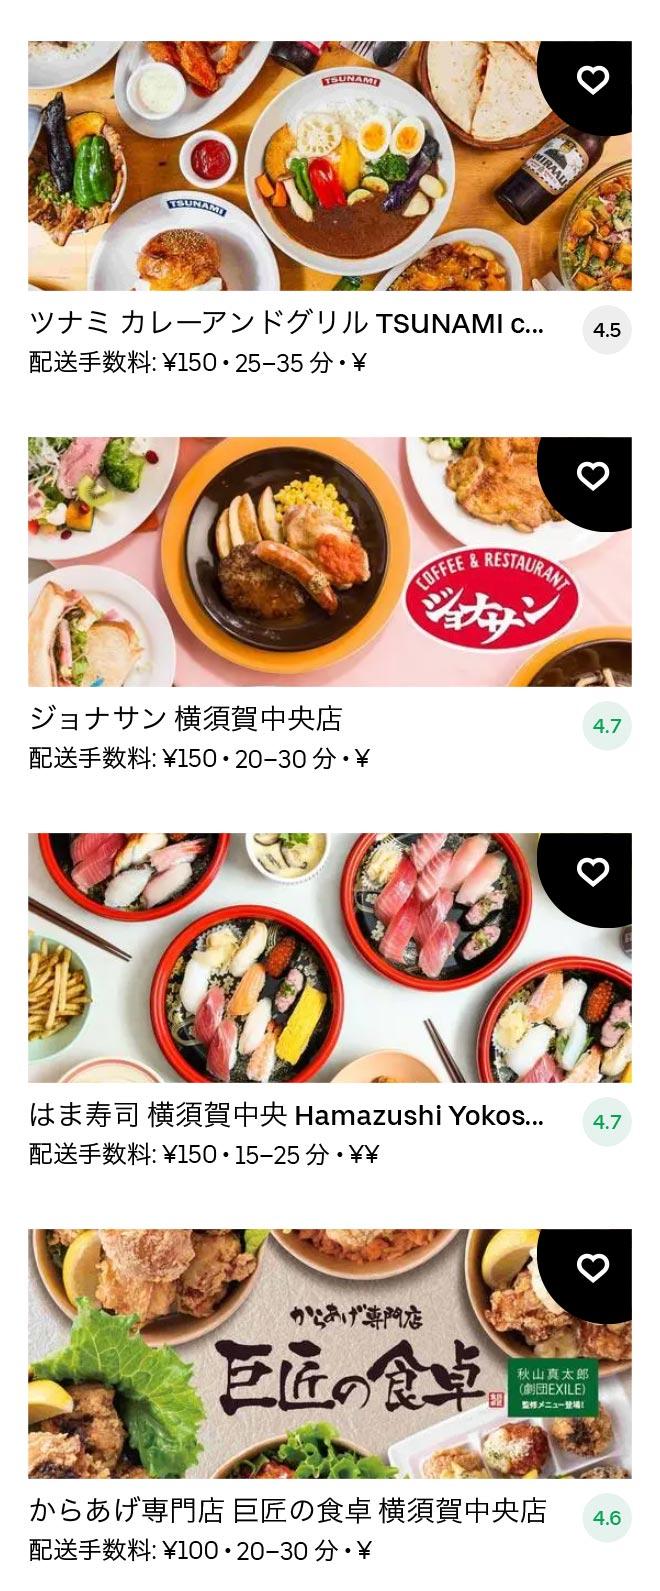 Yokosuka chuo menu 2011 08